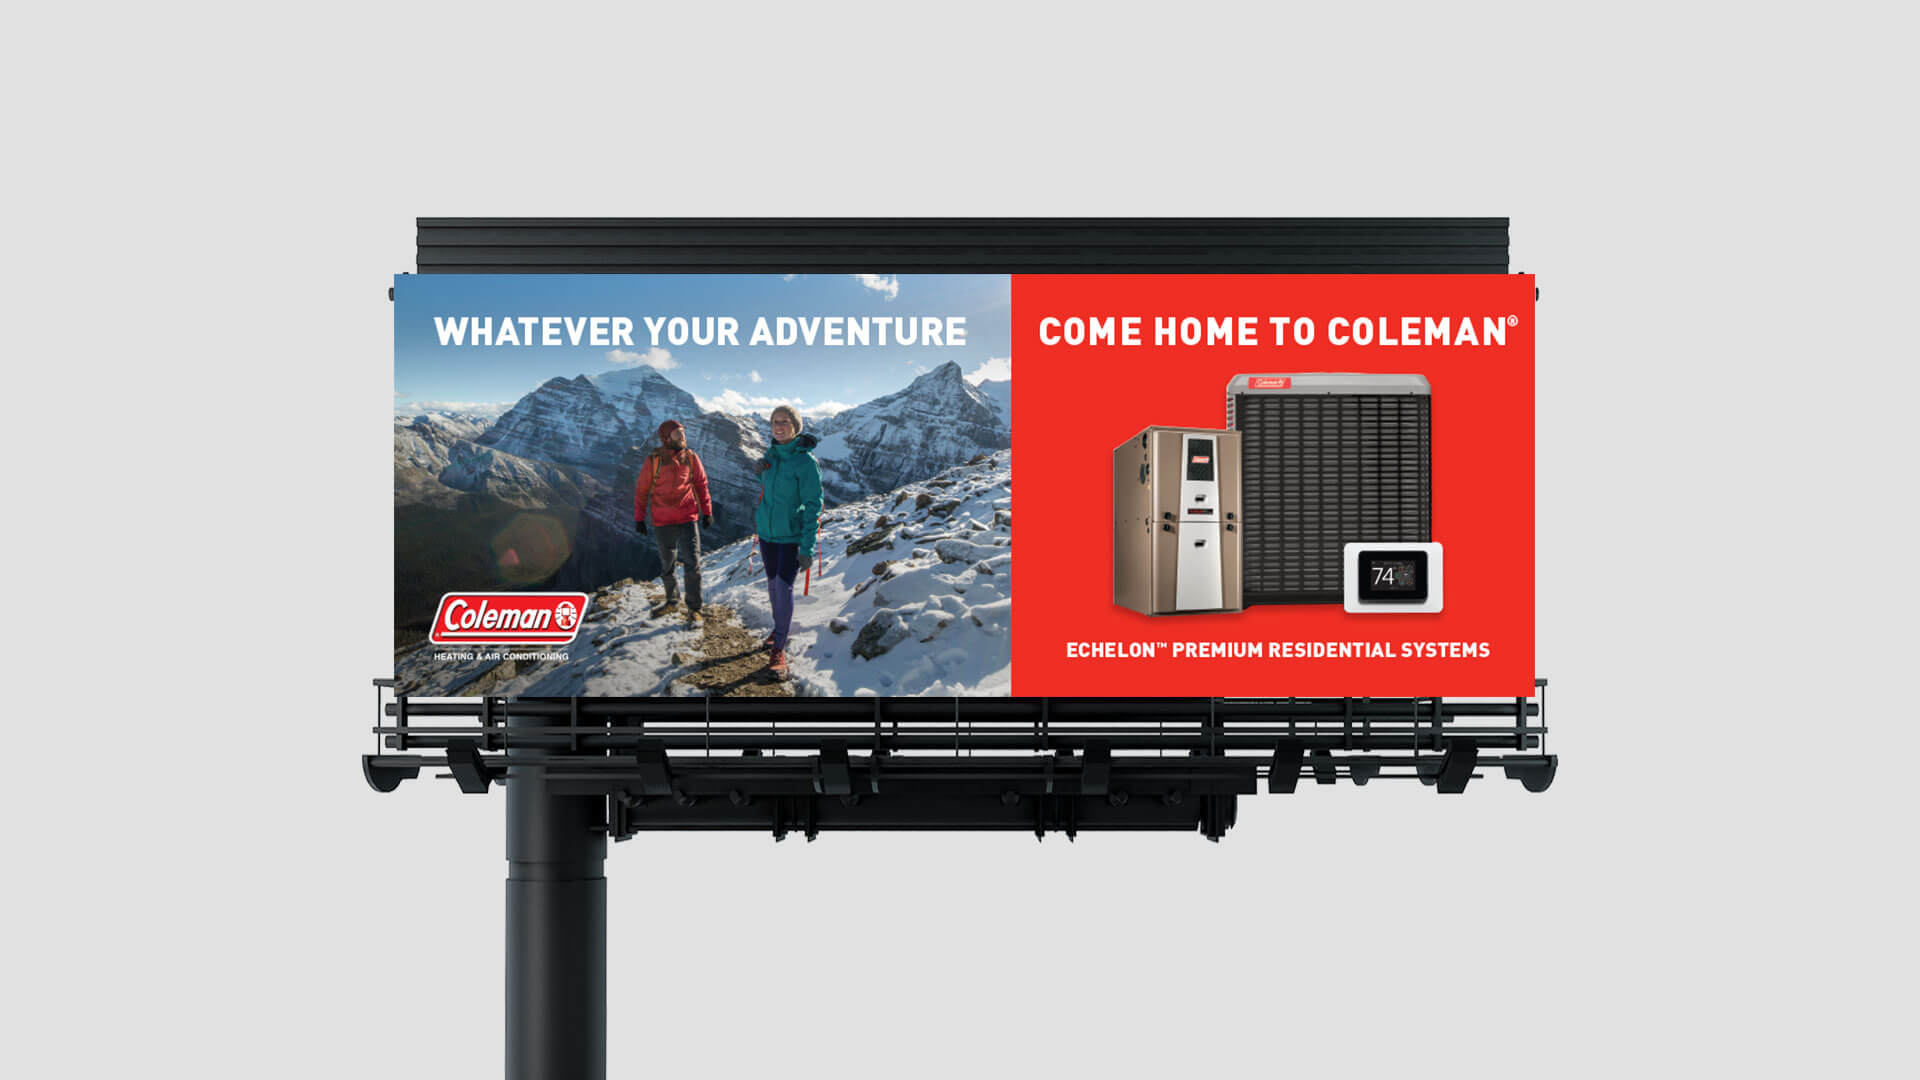 col-p3-consumer-billboard.jpg